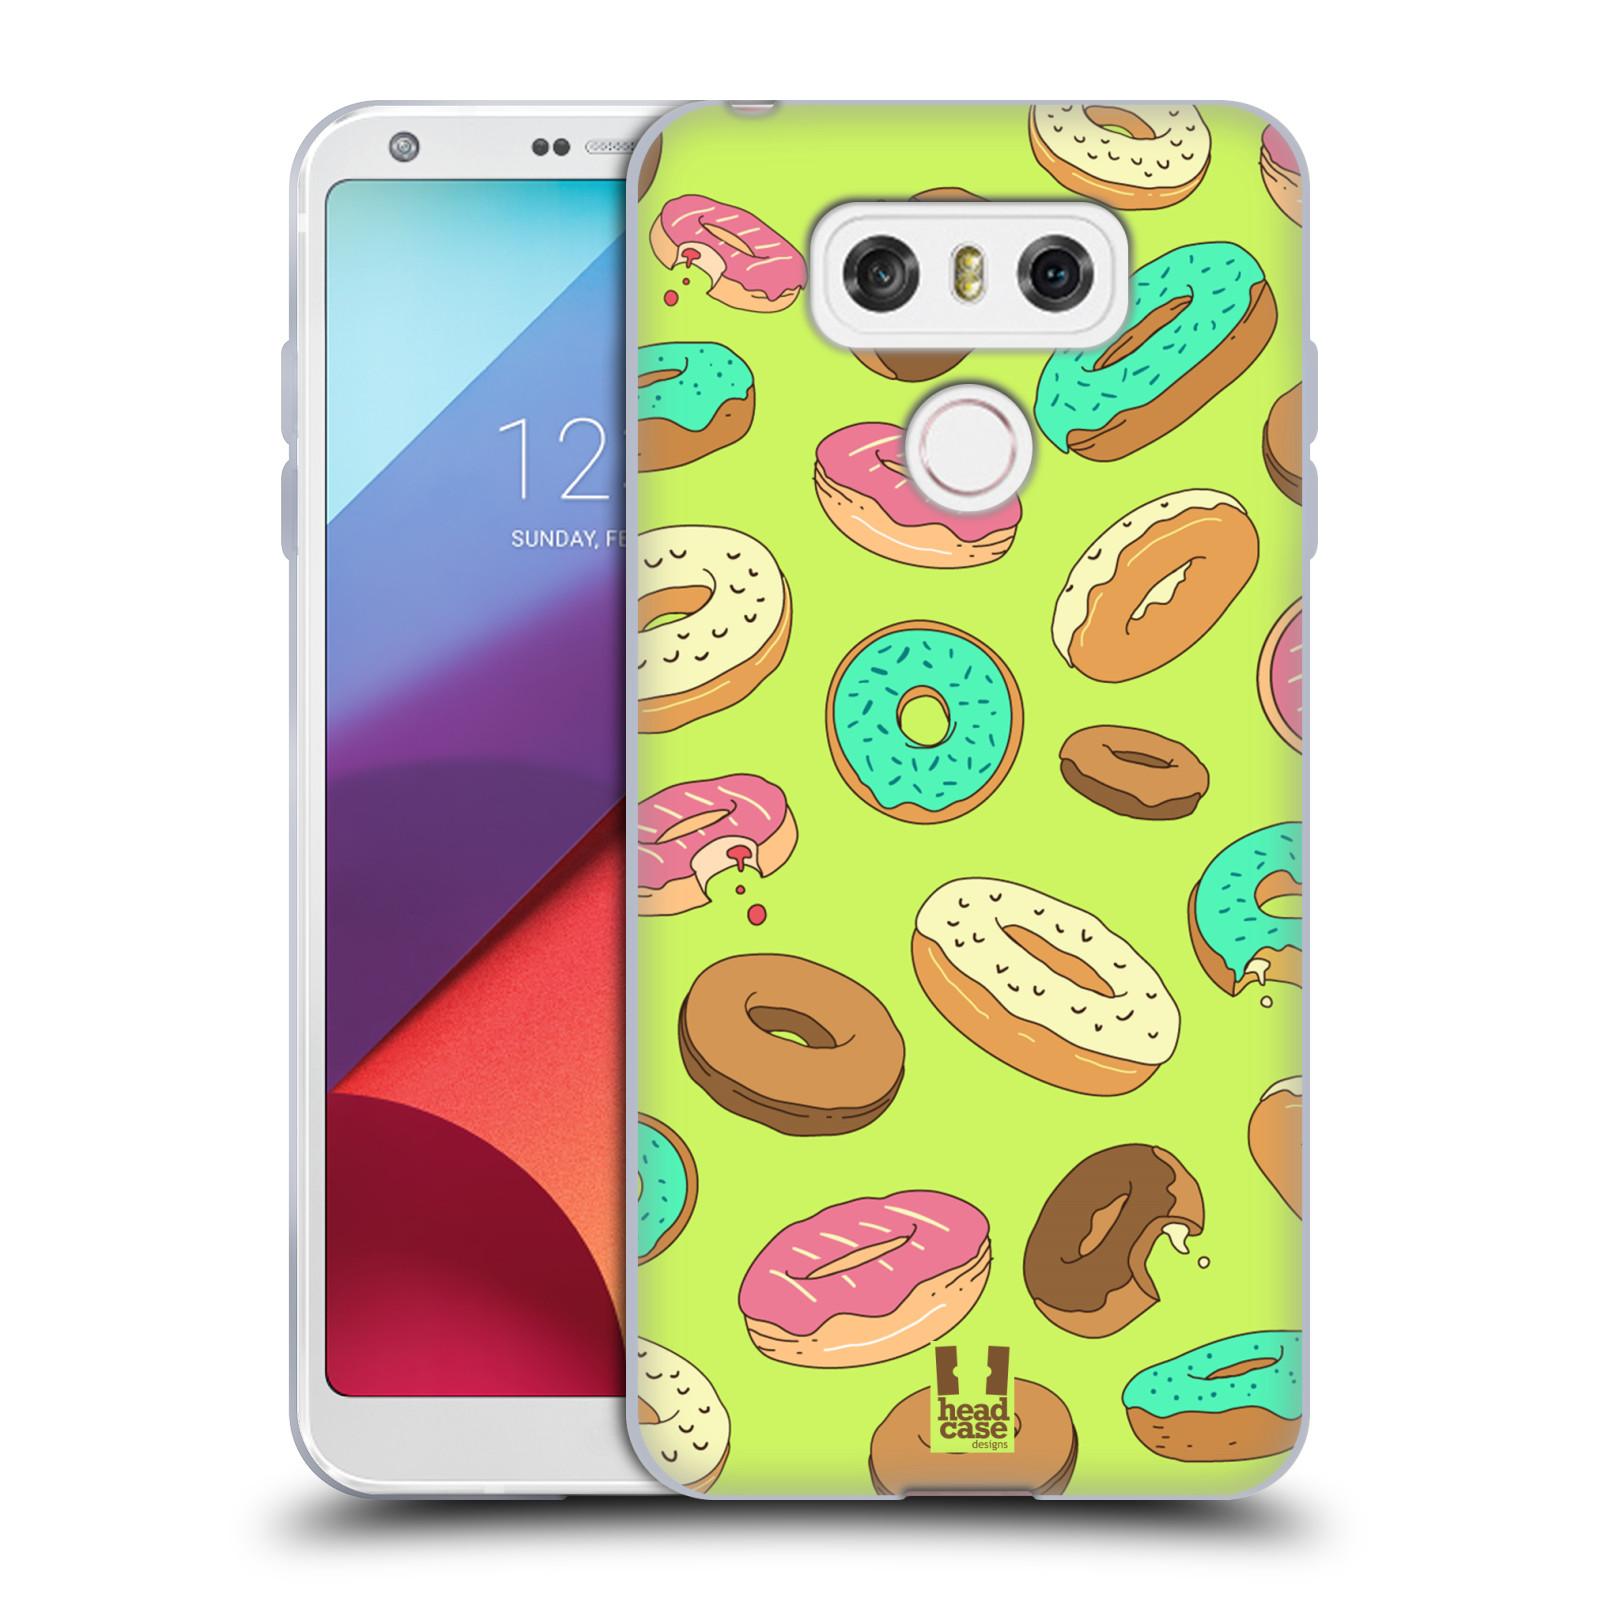 Silikonové pouzdro na mobil LG G6 - Head Case DONUTKY (Silikonový kryt či obal na mobilní telefon LG G6 H870 / LG G6 Dual SIM H870DS)